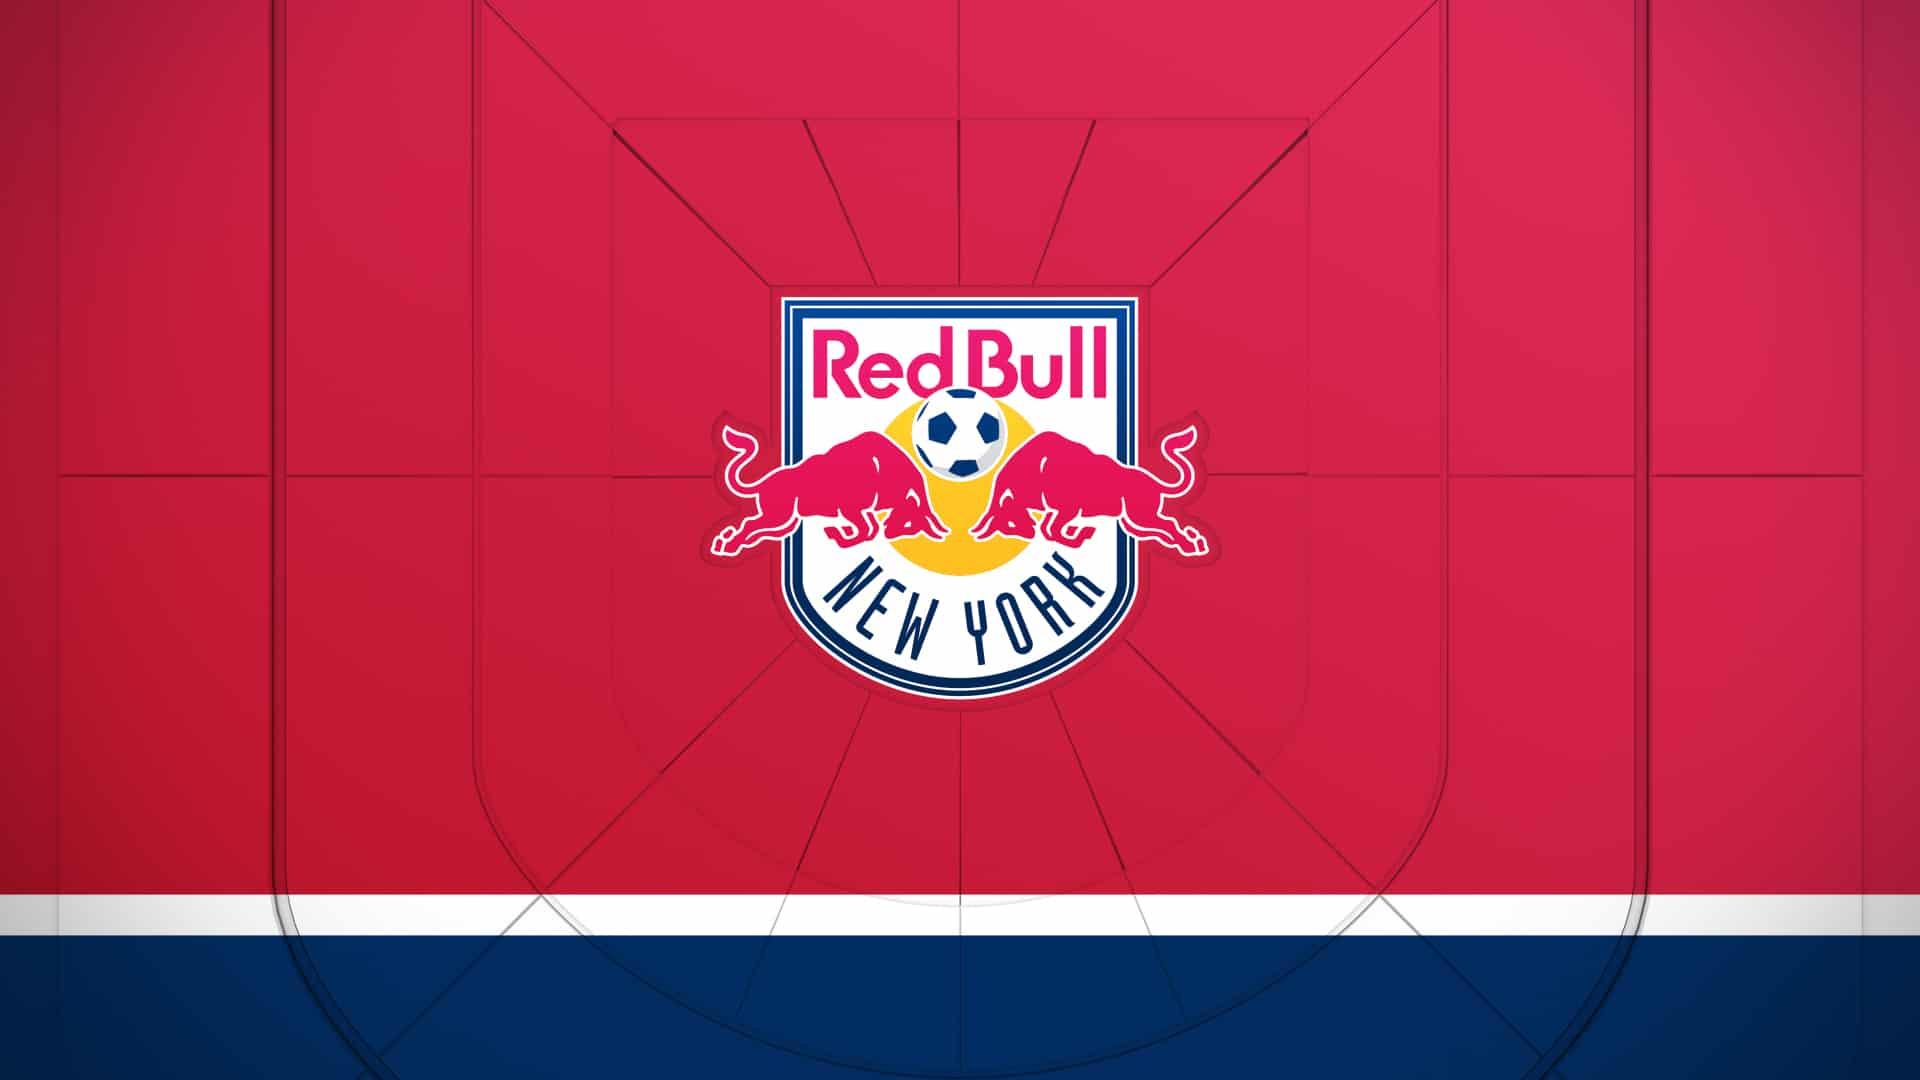 New York Red Bulls - MLS Team Preview 2019